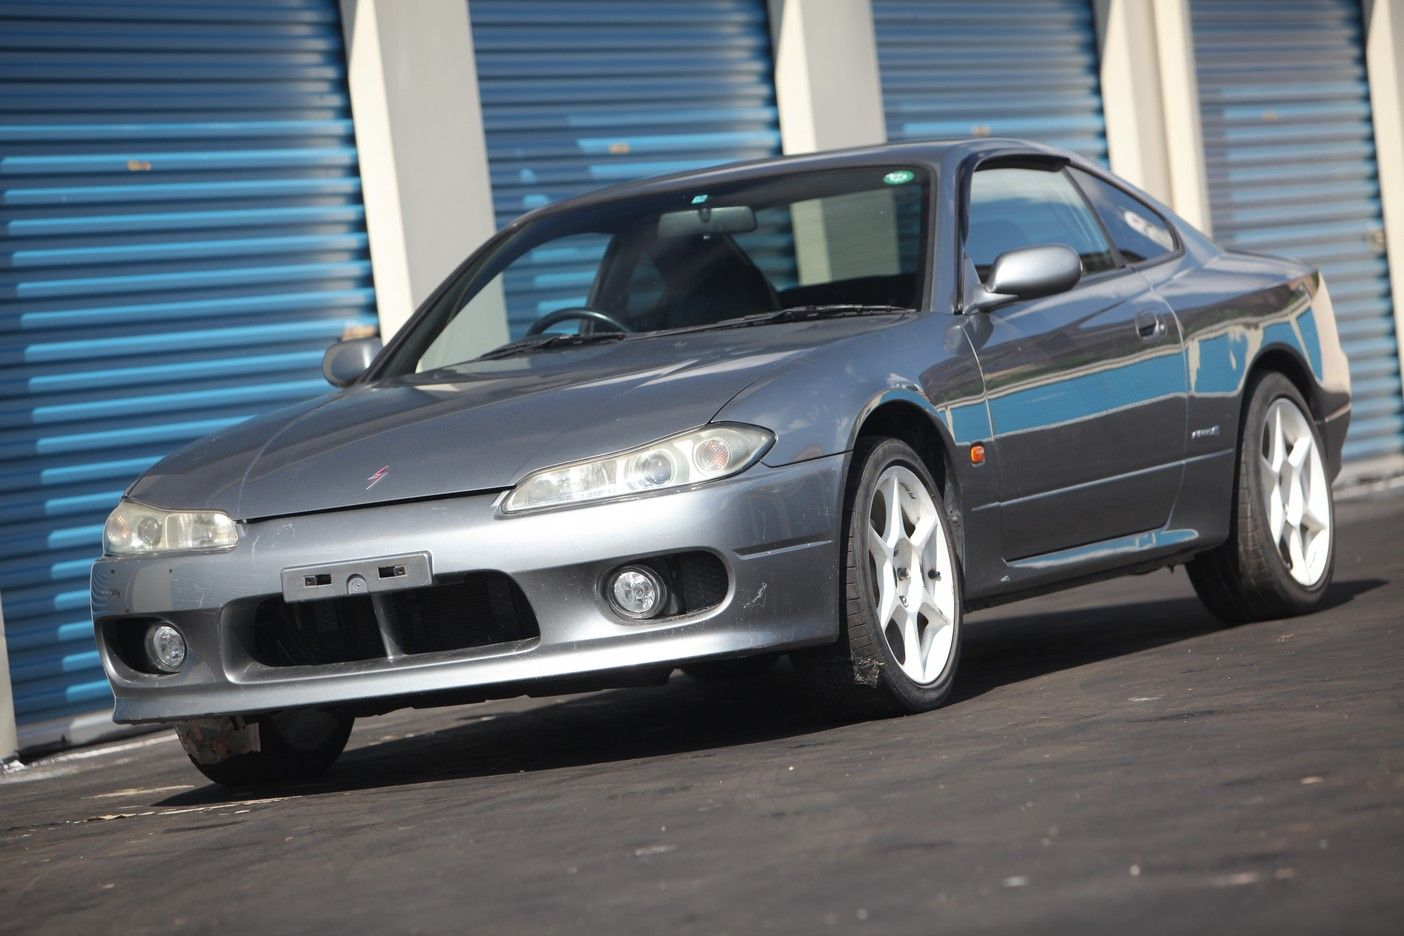 2001 Nissan Silvia S15 Specs Silvia Nissan Silvia S15